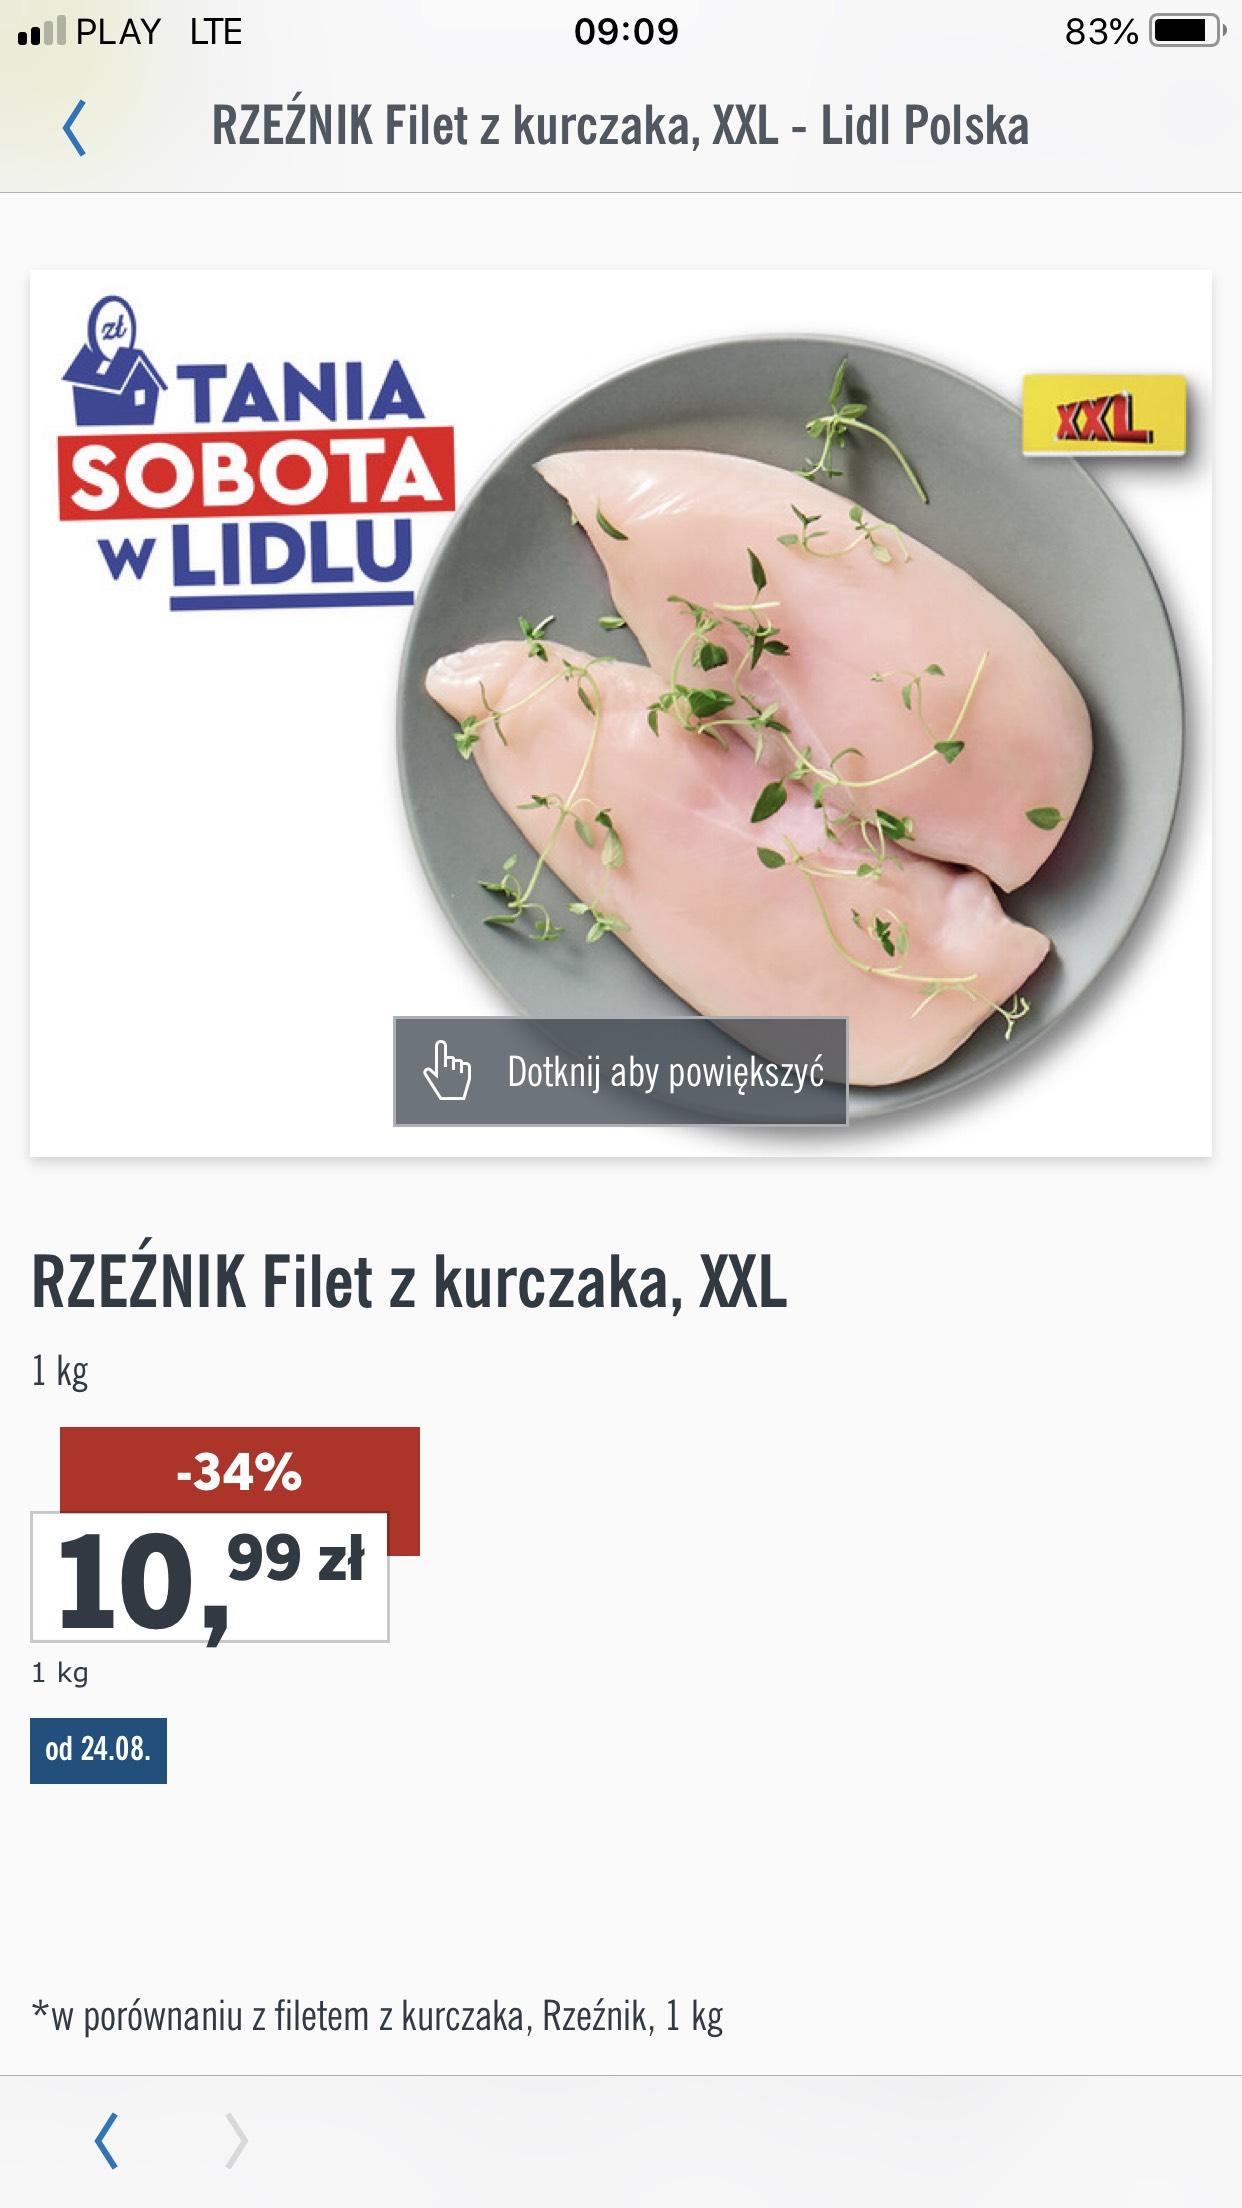 Filet z piersi kurczaka 10,99 zł/kg LIDL